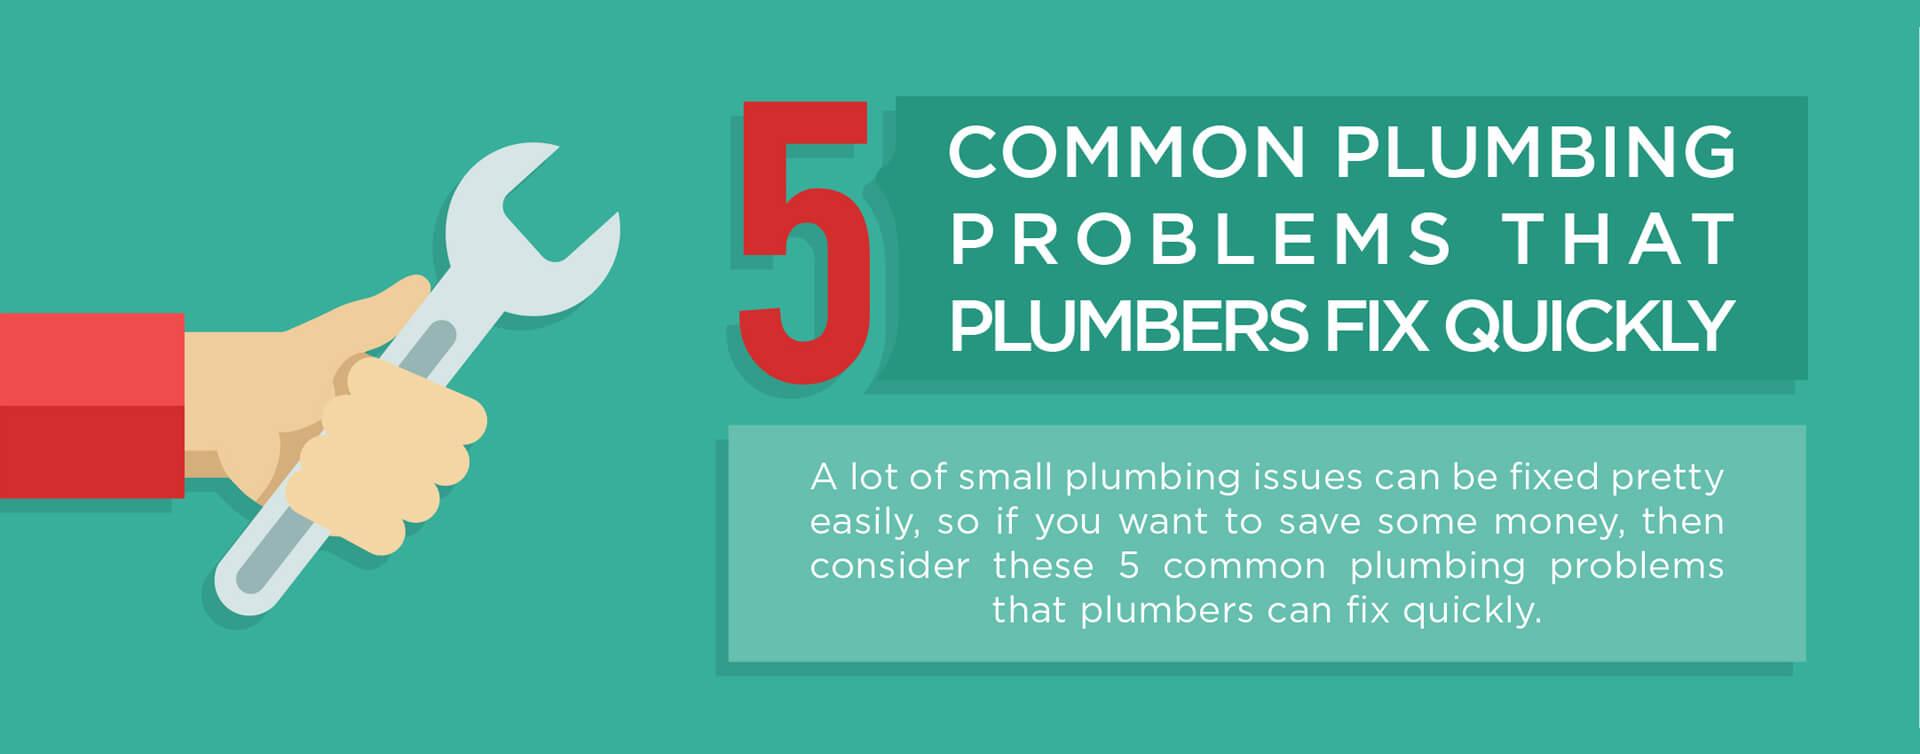 5 common plumbing problems banner